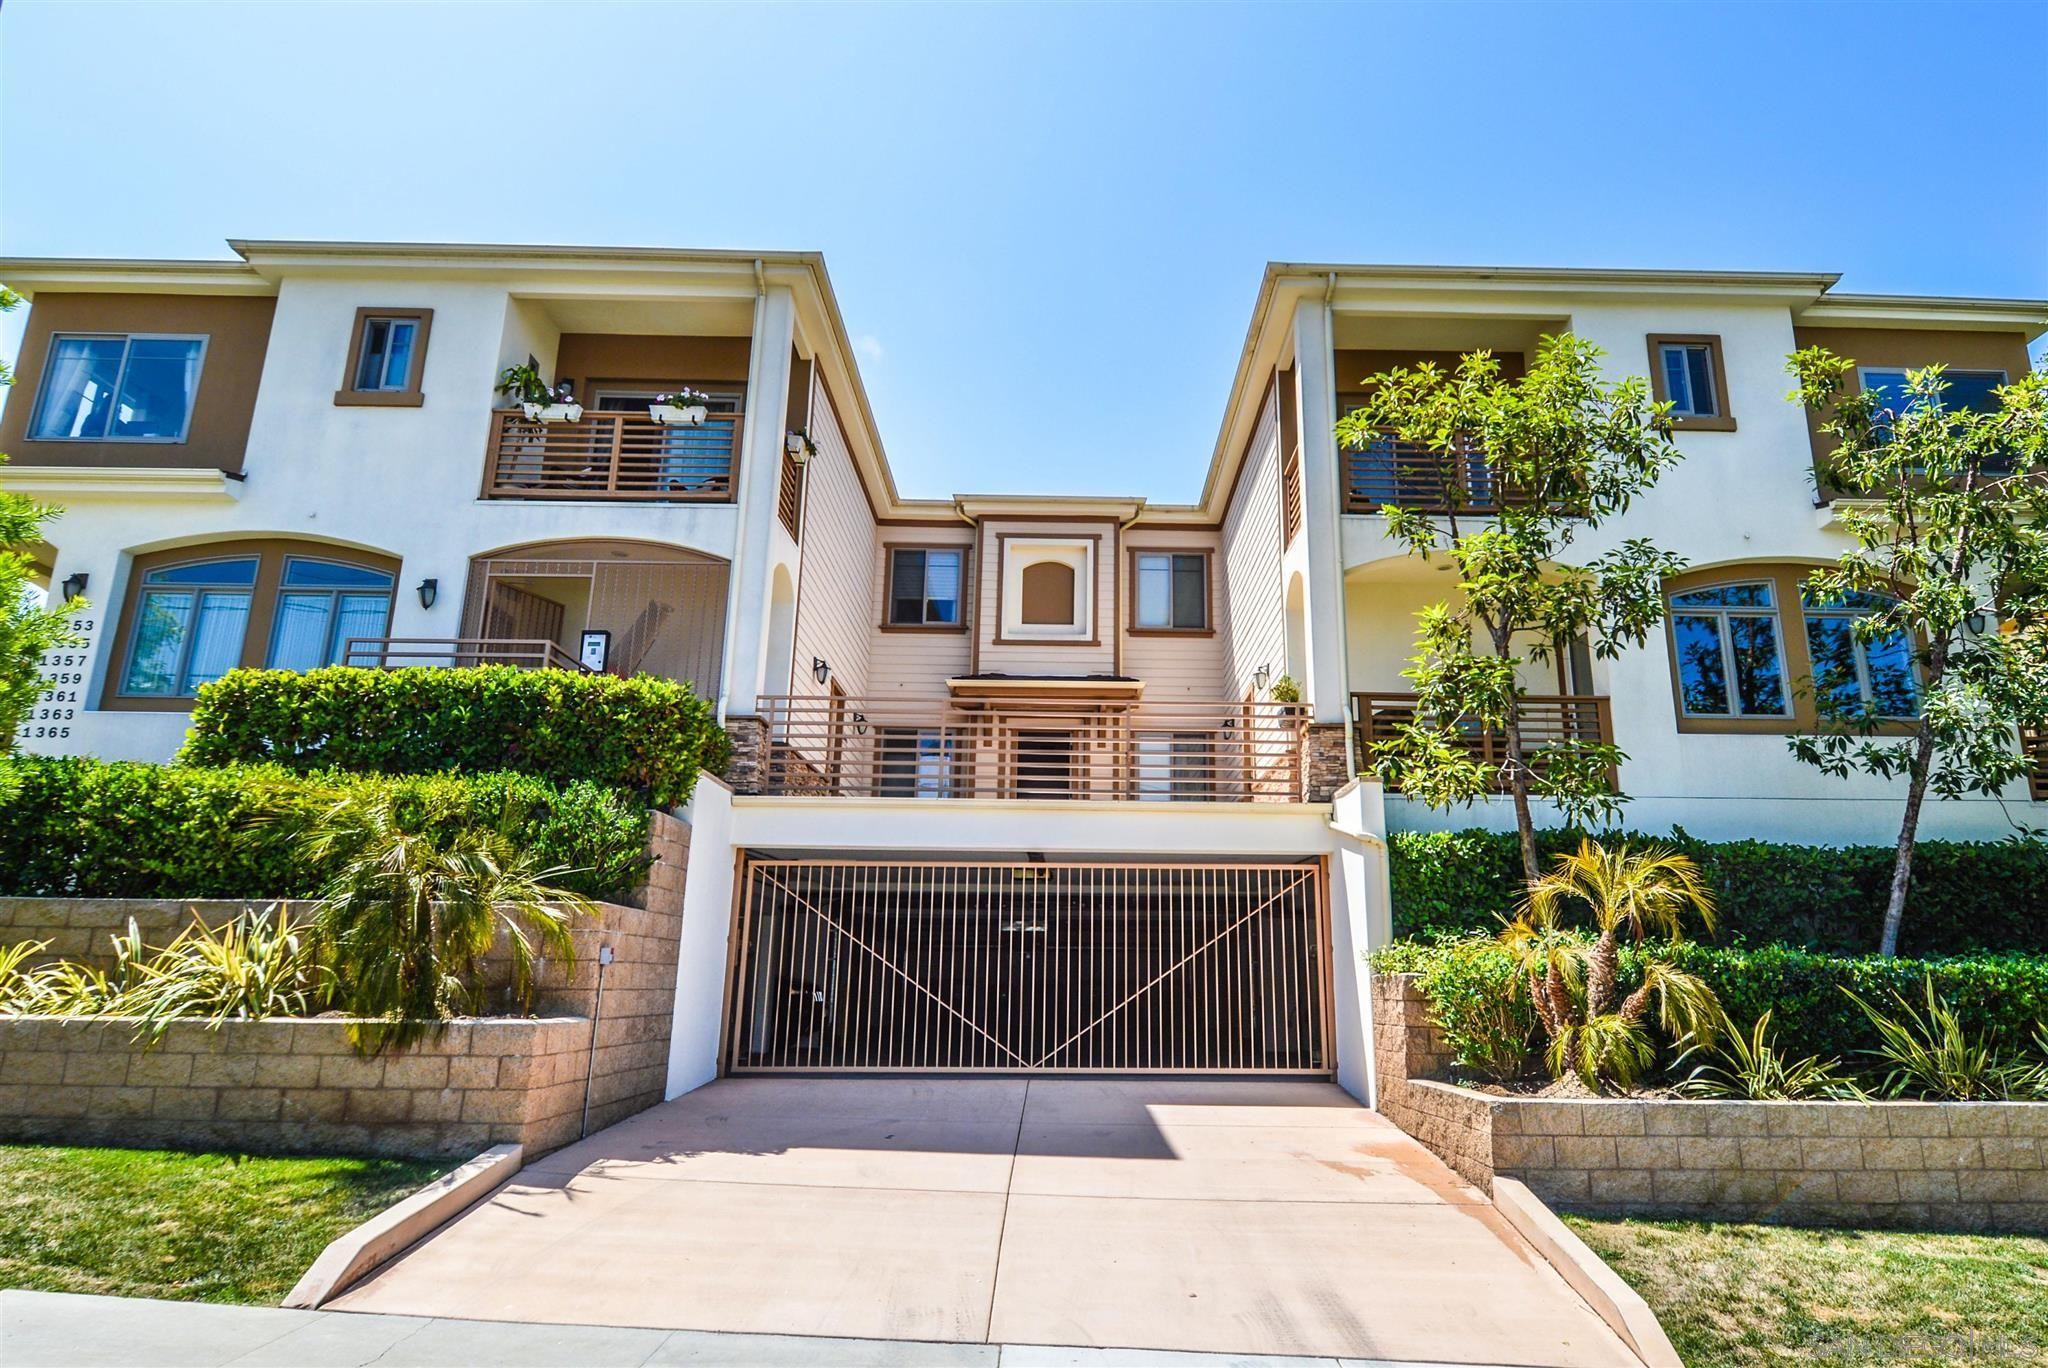 Main Photo: PACIFIC BEACH Condo for sale : 2 bedrooms : 1361 La Palma St in San Diego